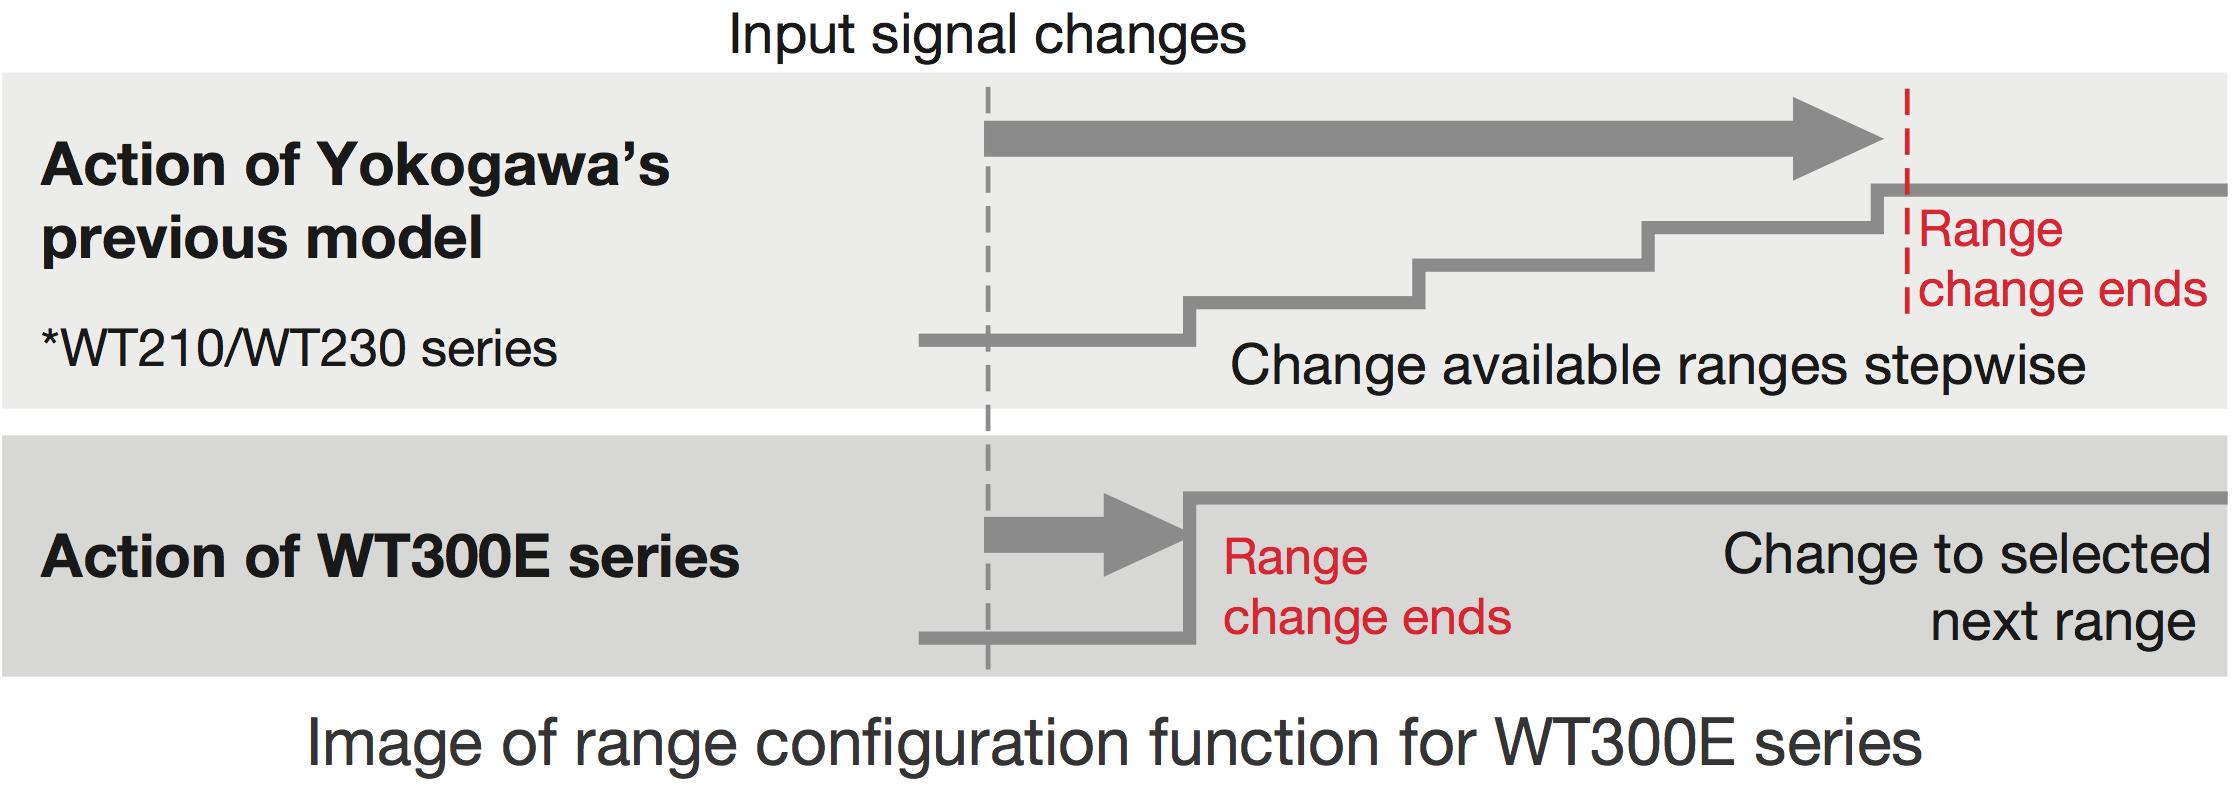 Wt300e Economy Yokogawa Test Measurement Corporation Sine Wave Inverter Circuit 500 Watt Pure Diagram 3 Input Signal Change